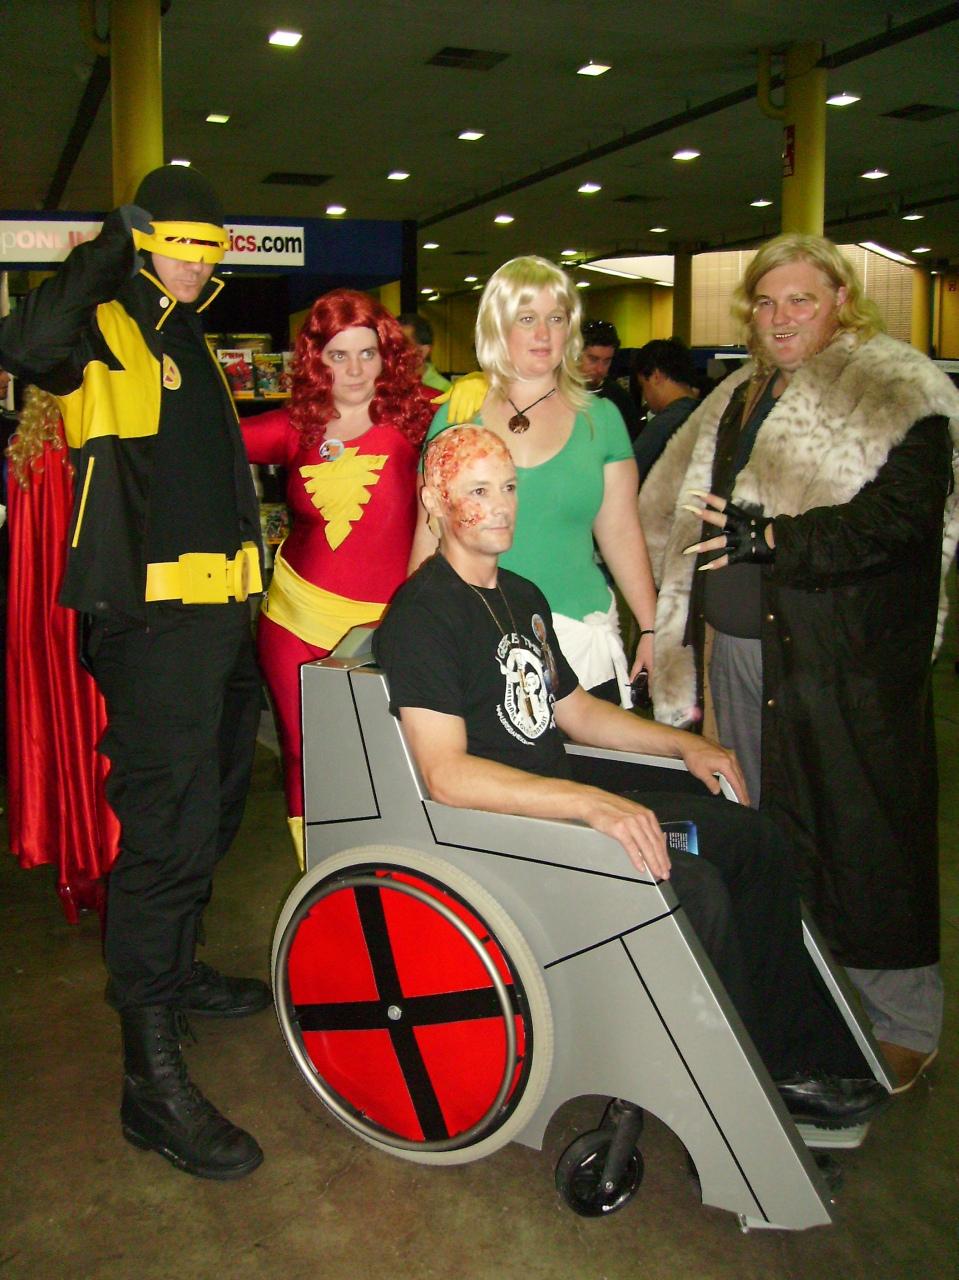 Professor X and assorted mutants